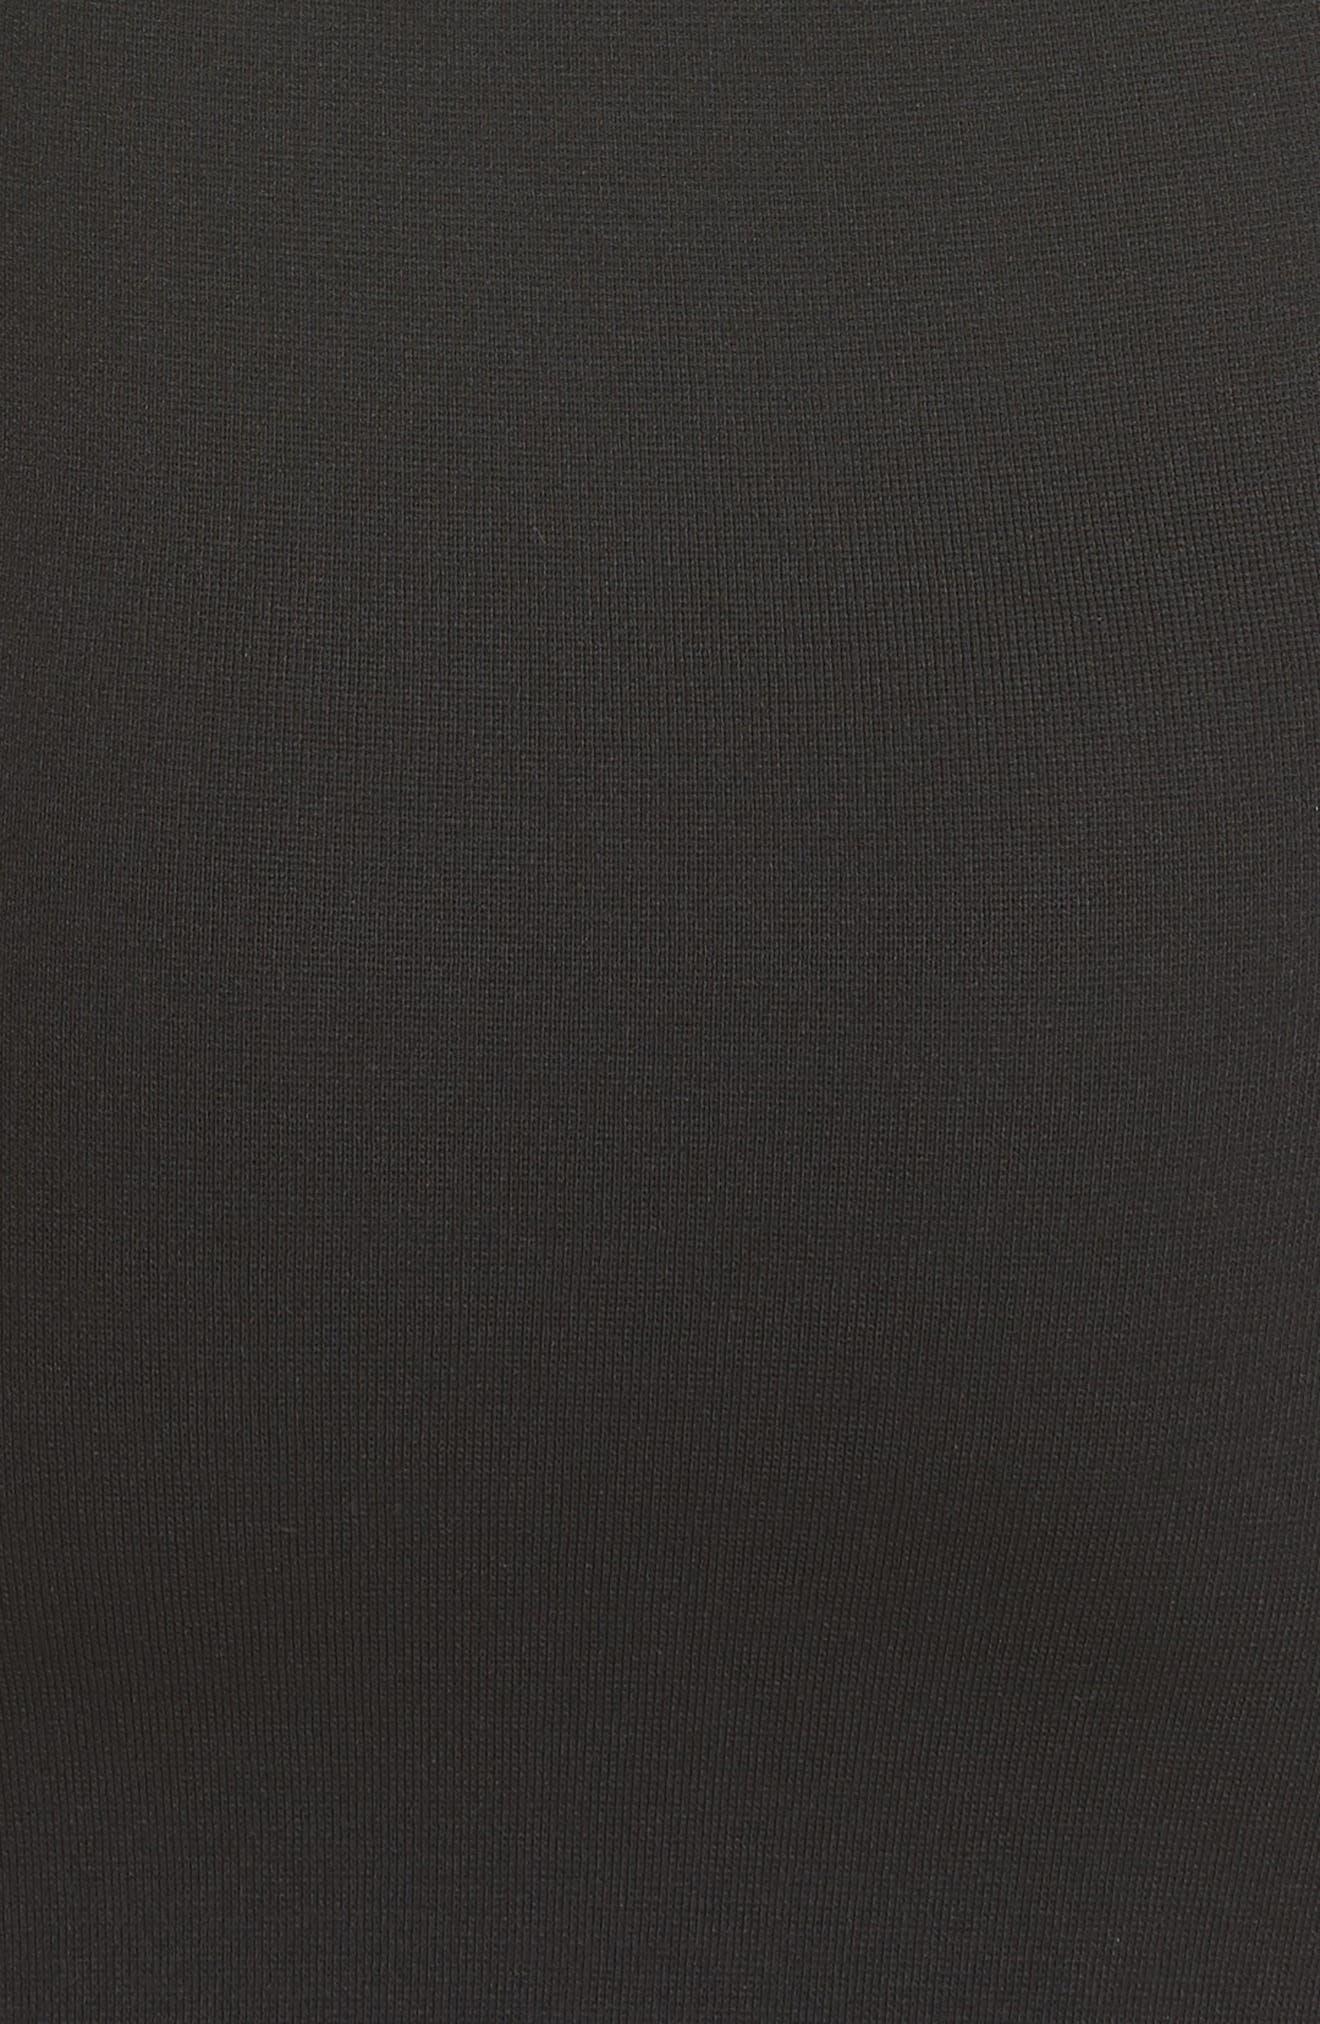 Alternate Image 3  - Burberry Marro Knit Dress